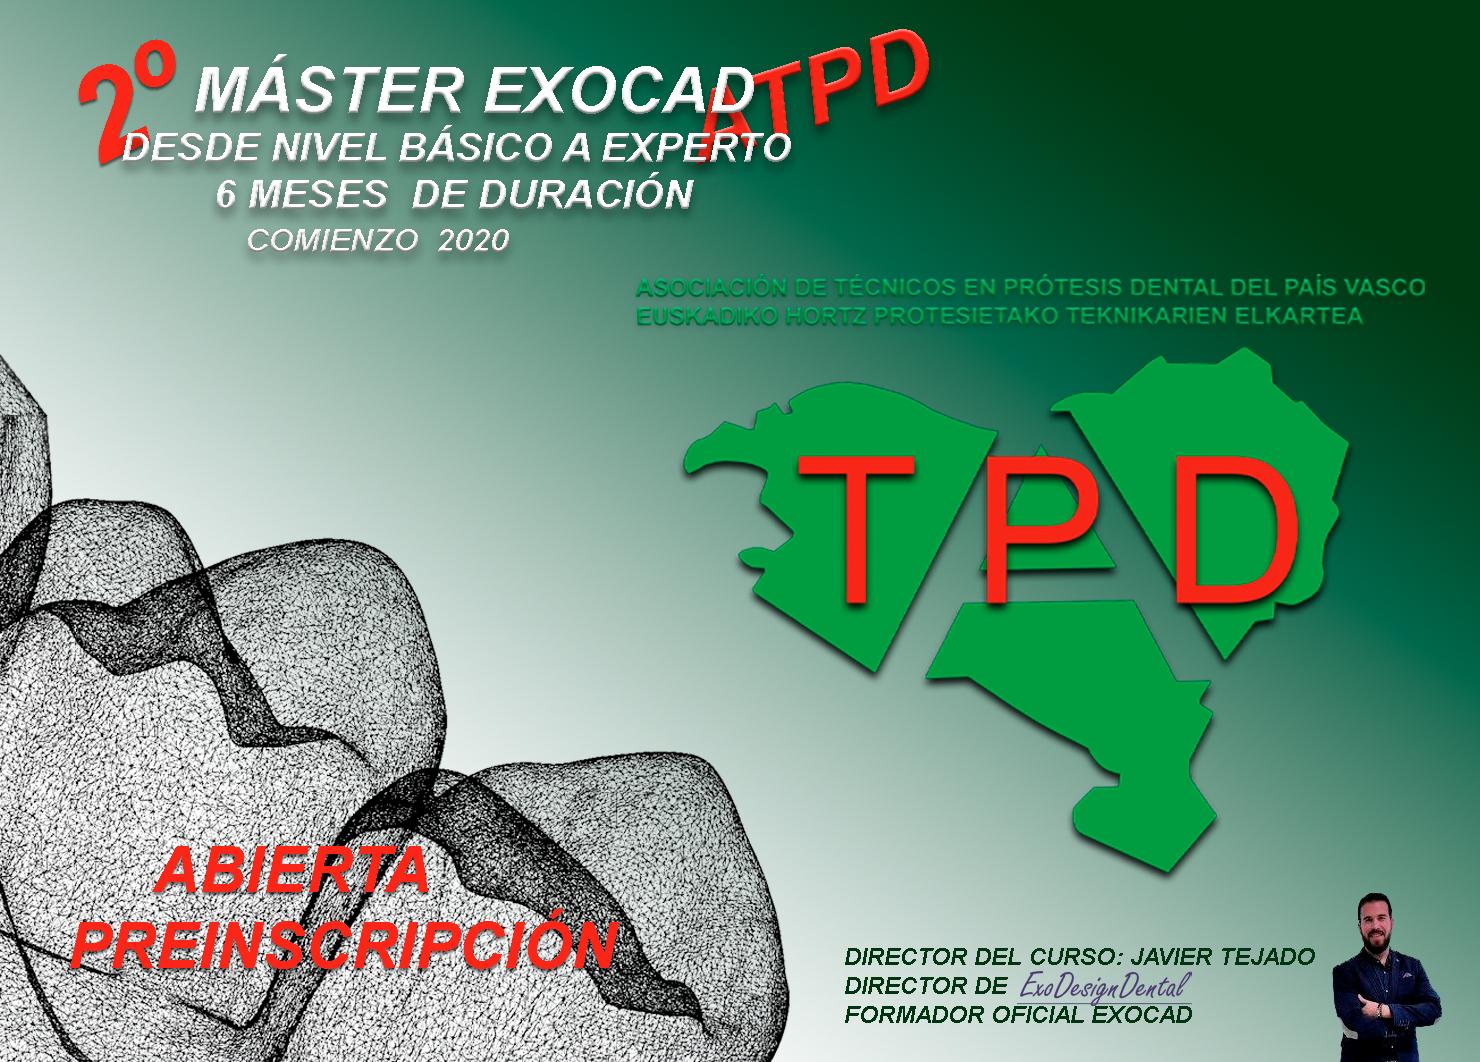 2ºMASTER EXOCAD ATPD  (COMPLETO)